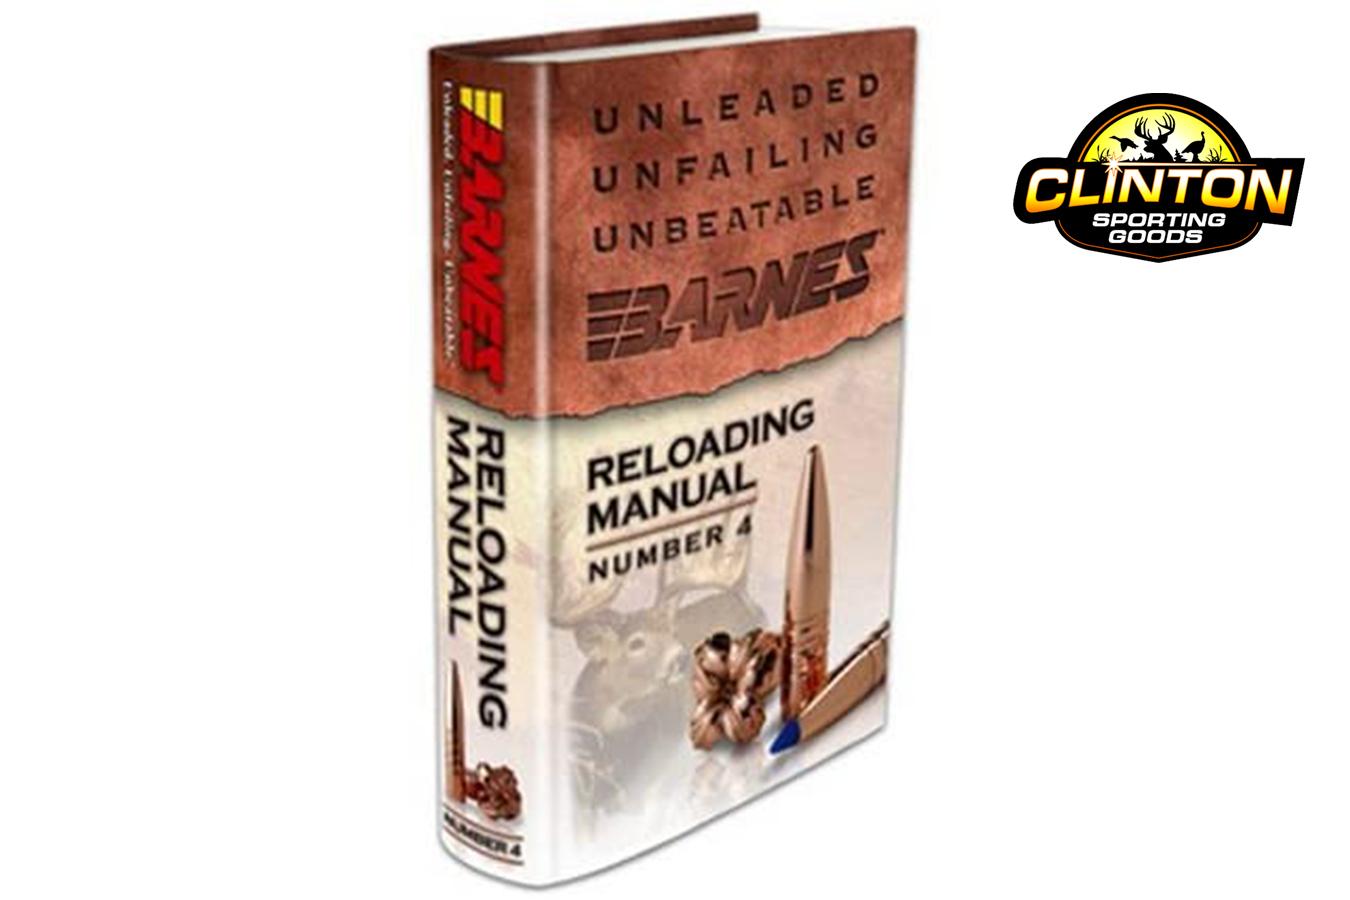 Barnes Reloading Manual #4   Clinton Sporting Goods